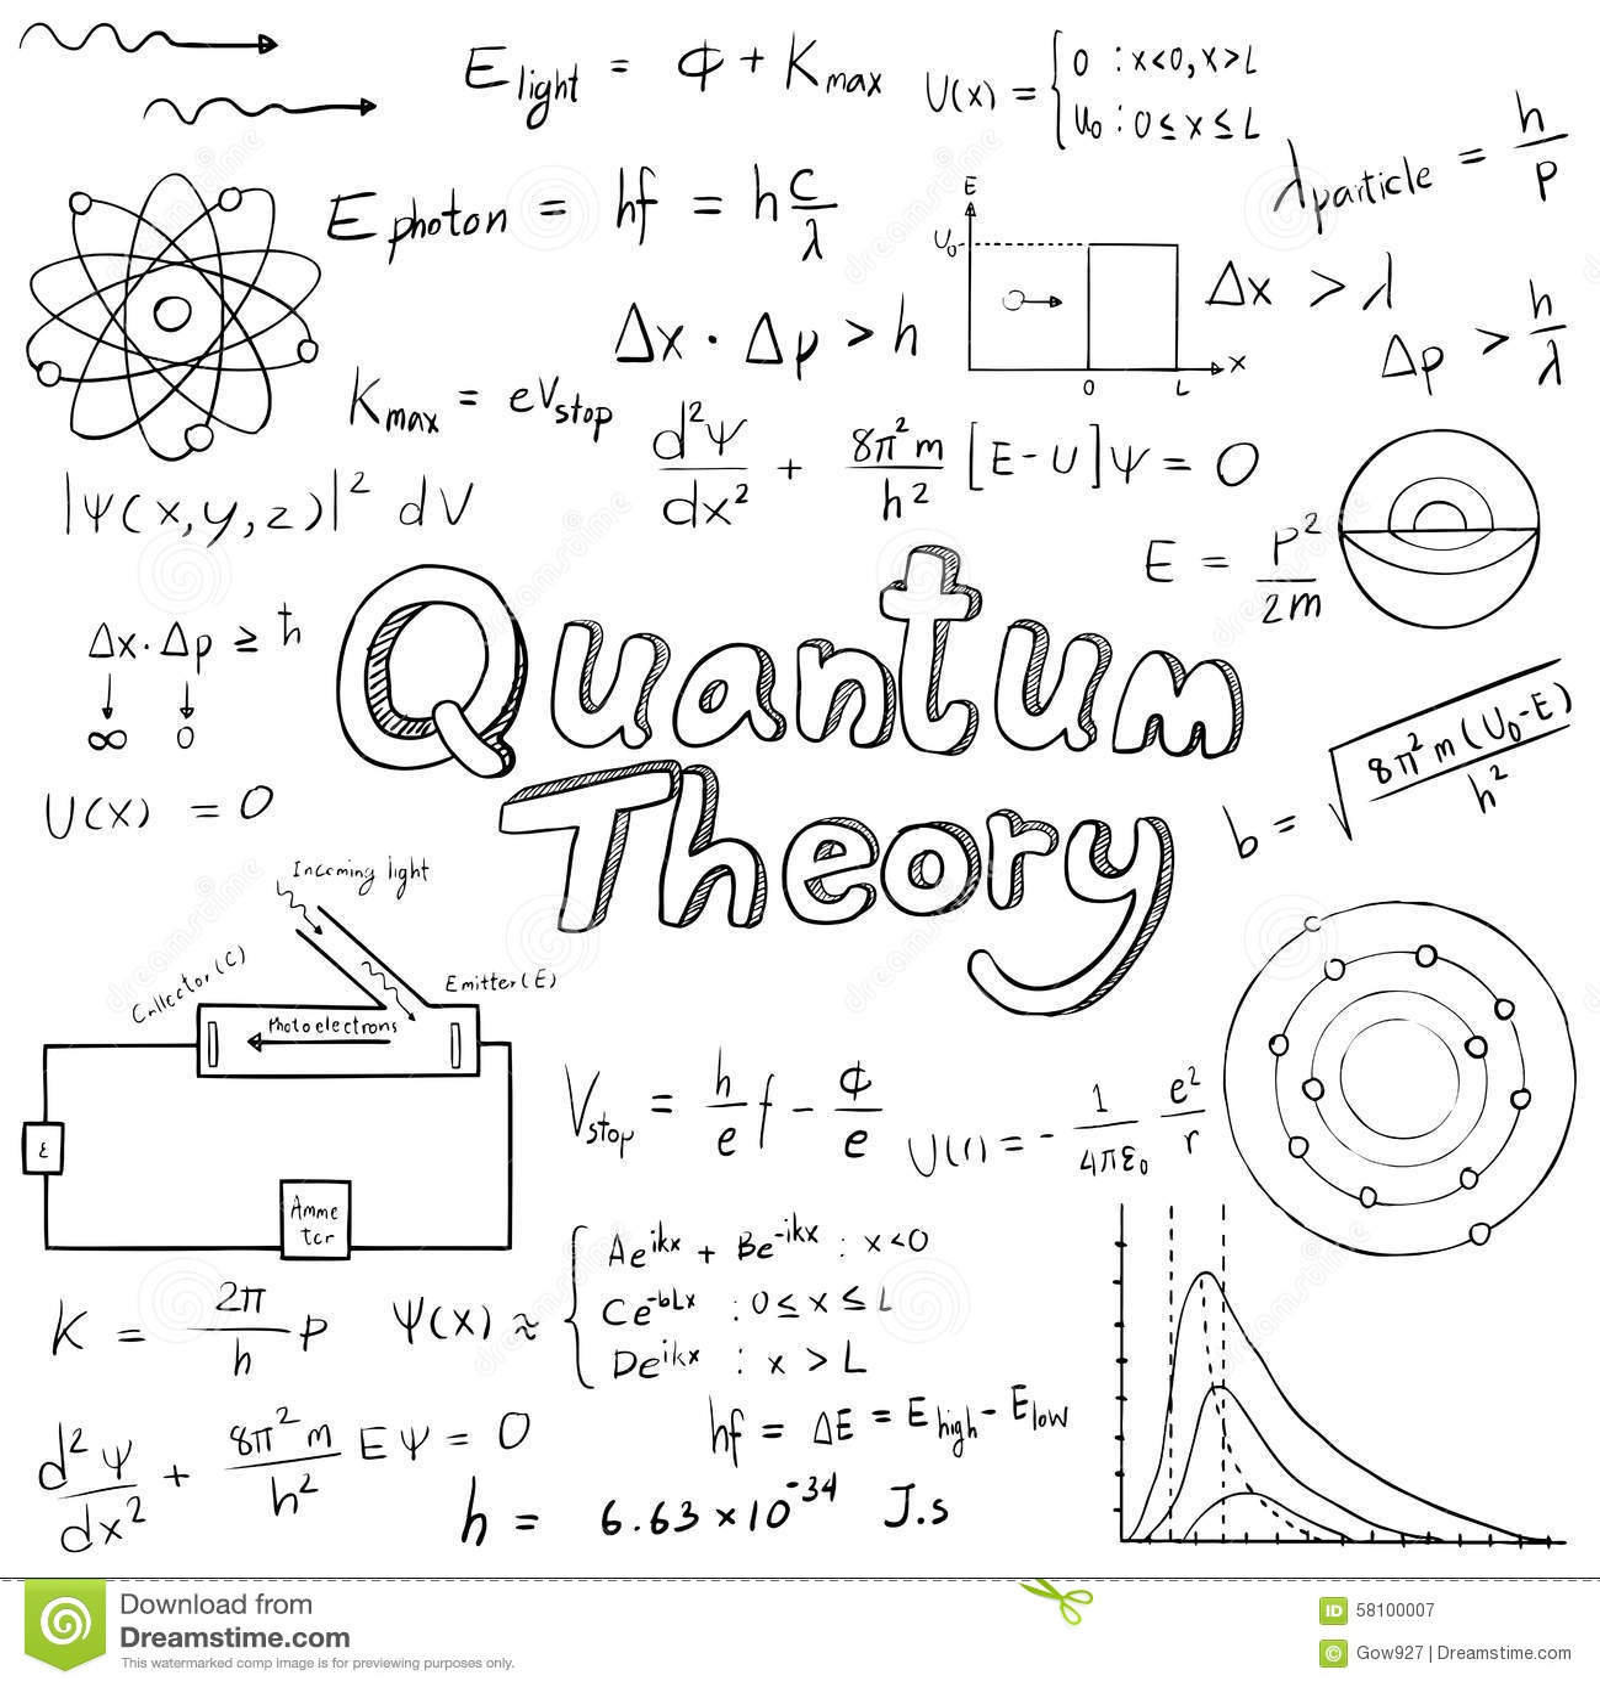 Quantum Theory Law And Physics Mathematical Formula